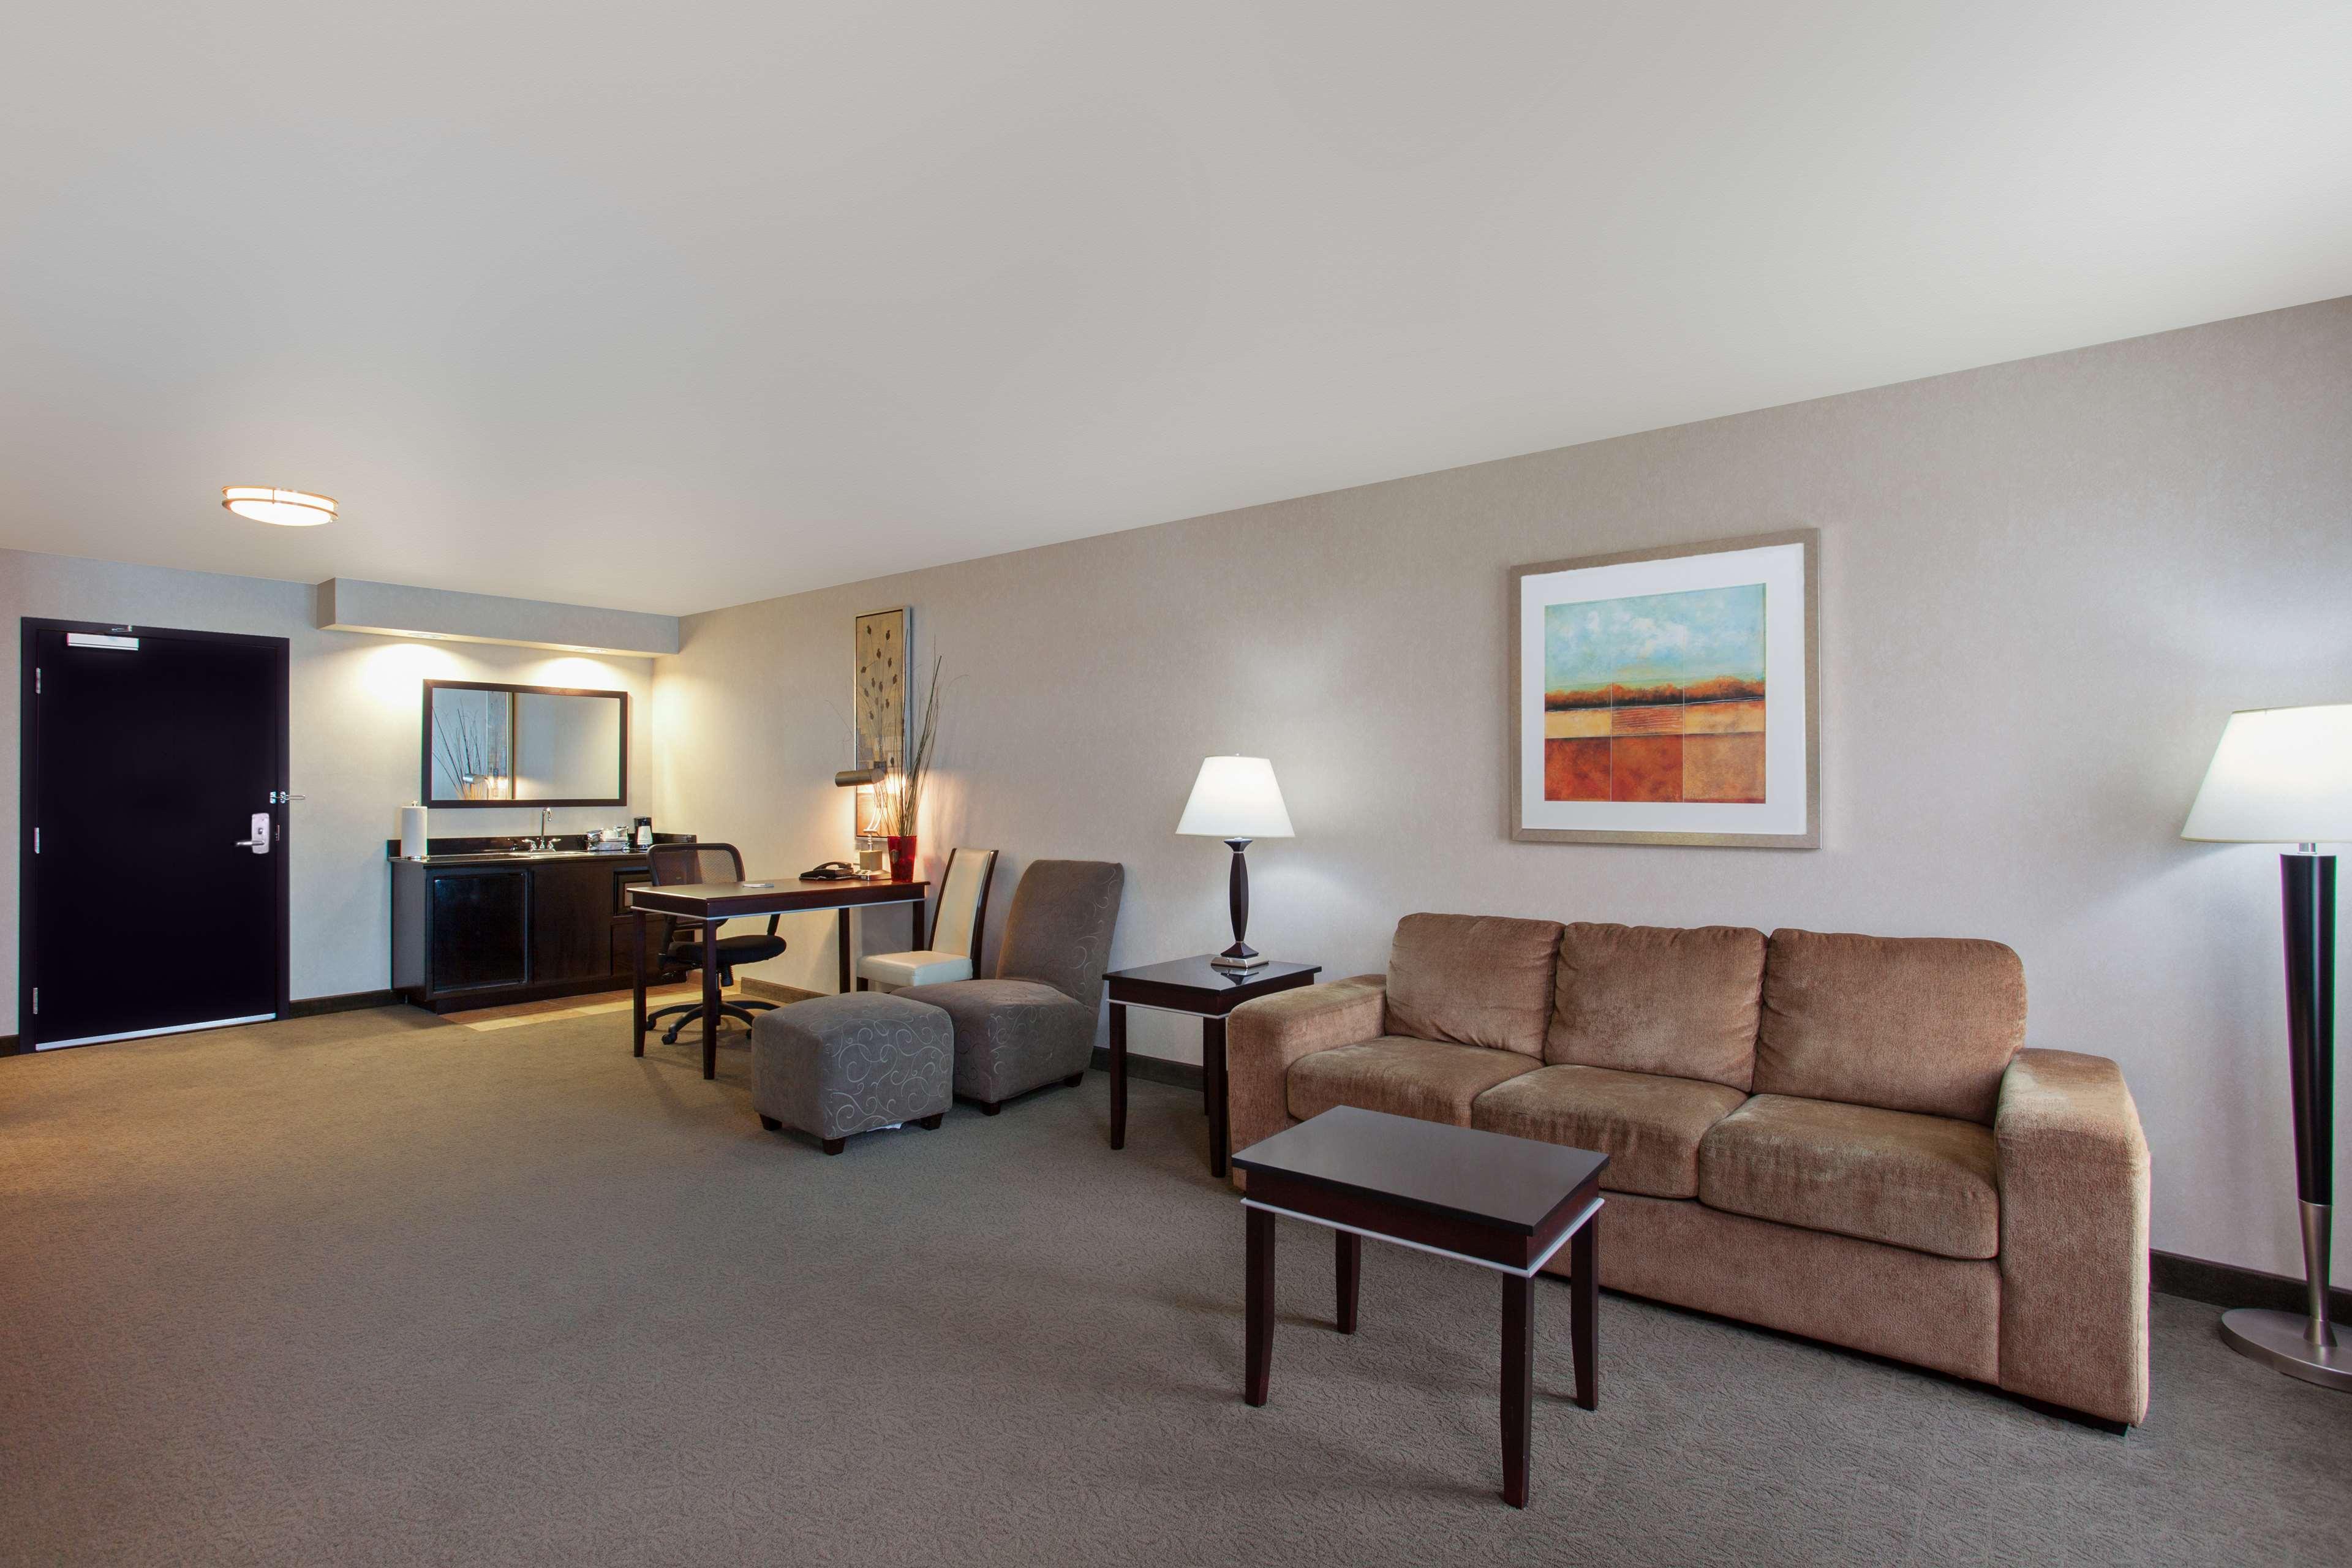 Hampton Inn & Suites Roseville image 12